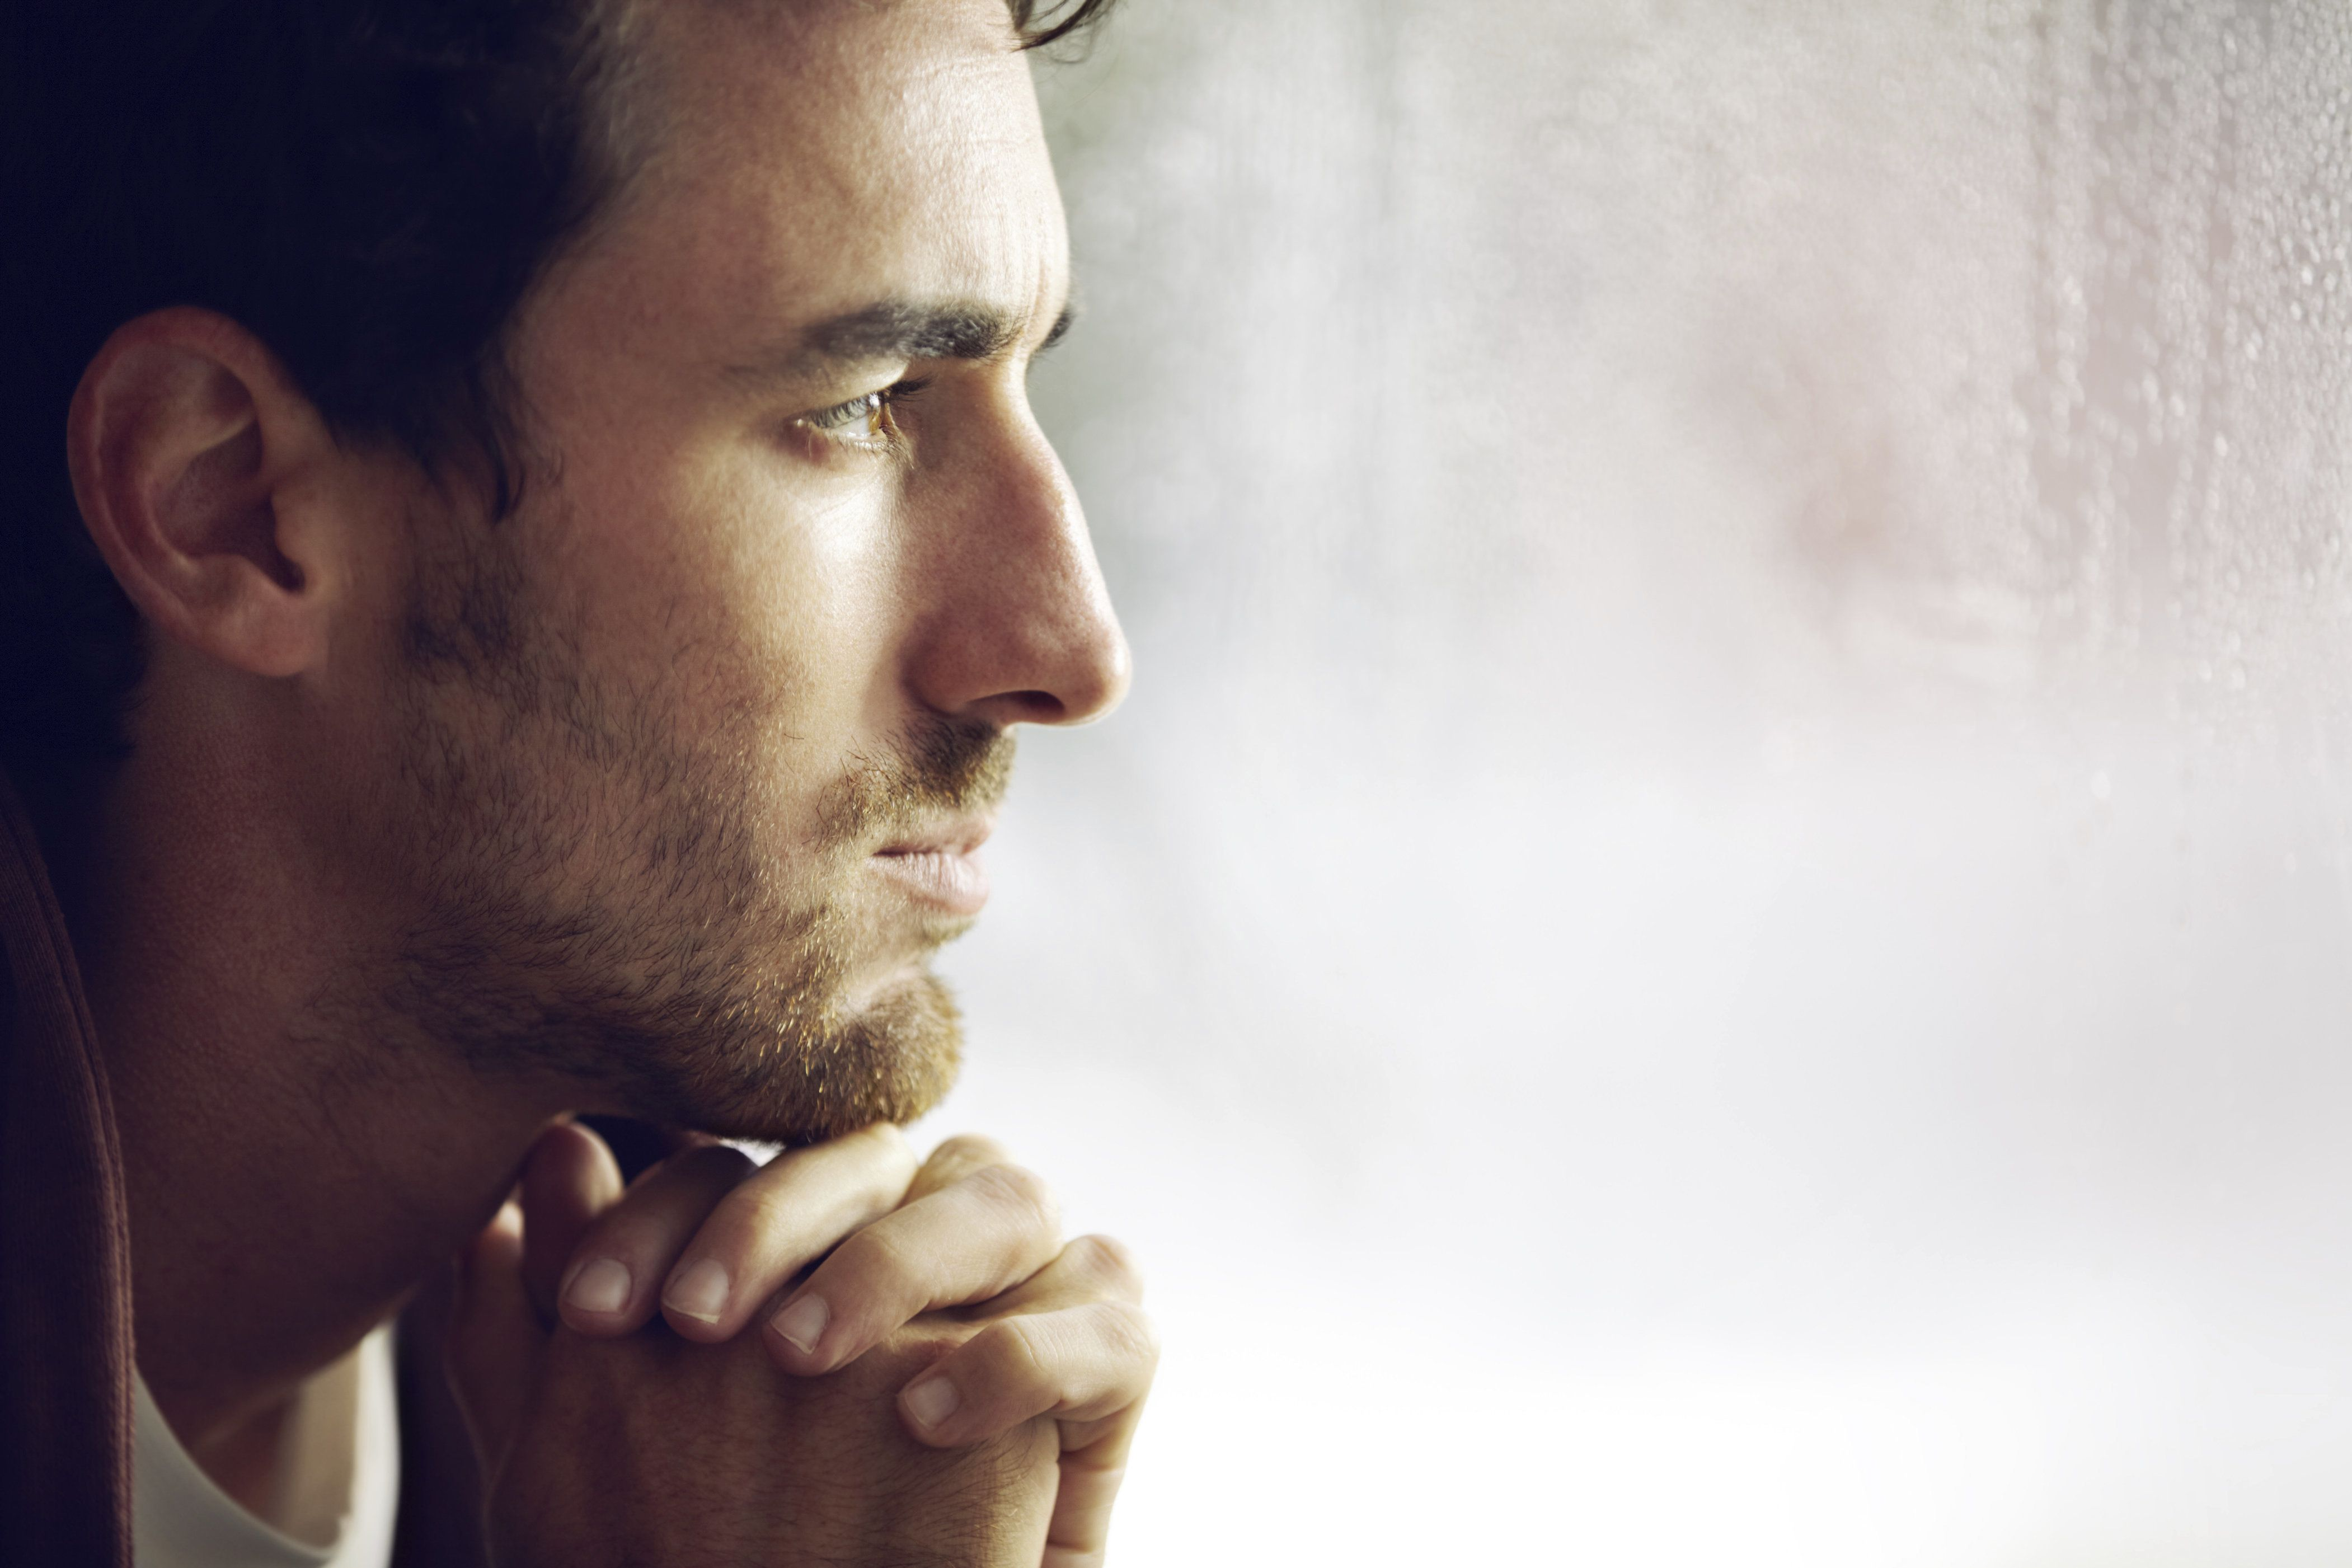 High Doses Of Vitamin B 'Help Reduce Schizophrenia